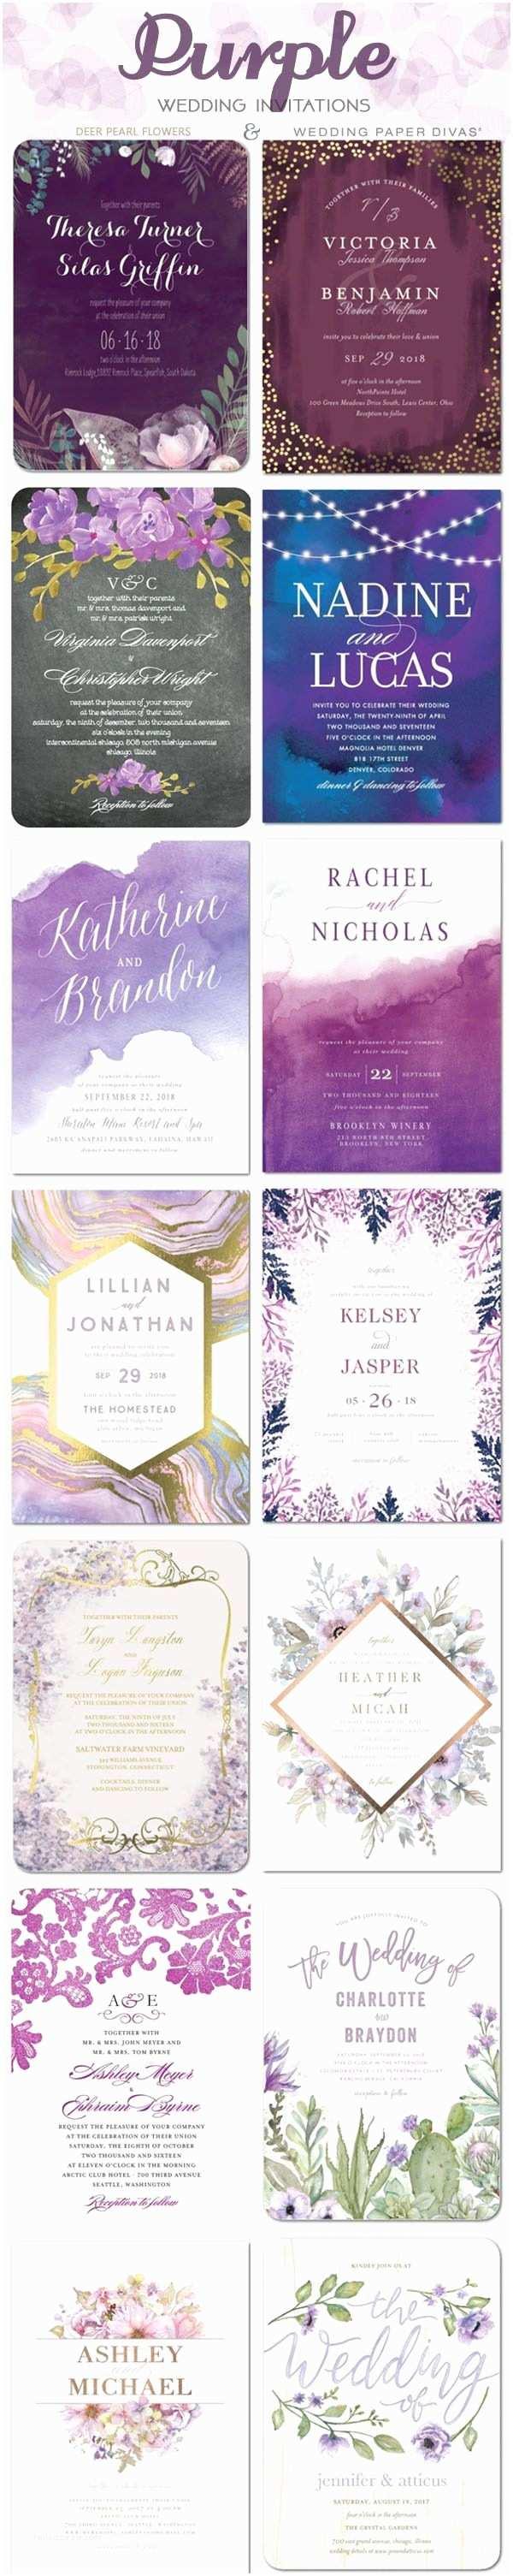 Shutterfly Wedding Invitations top 8 themed Shutterfly Wedding Invitations